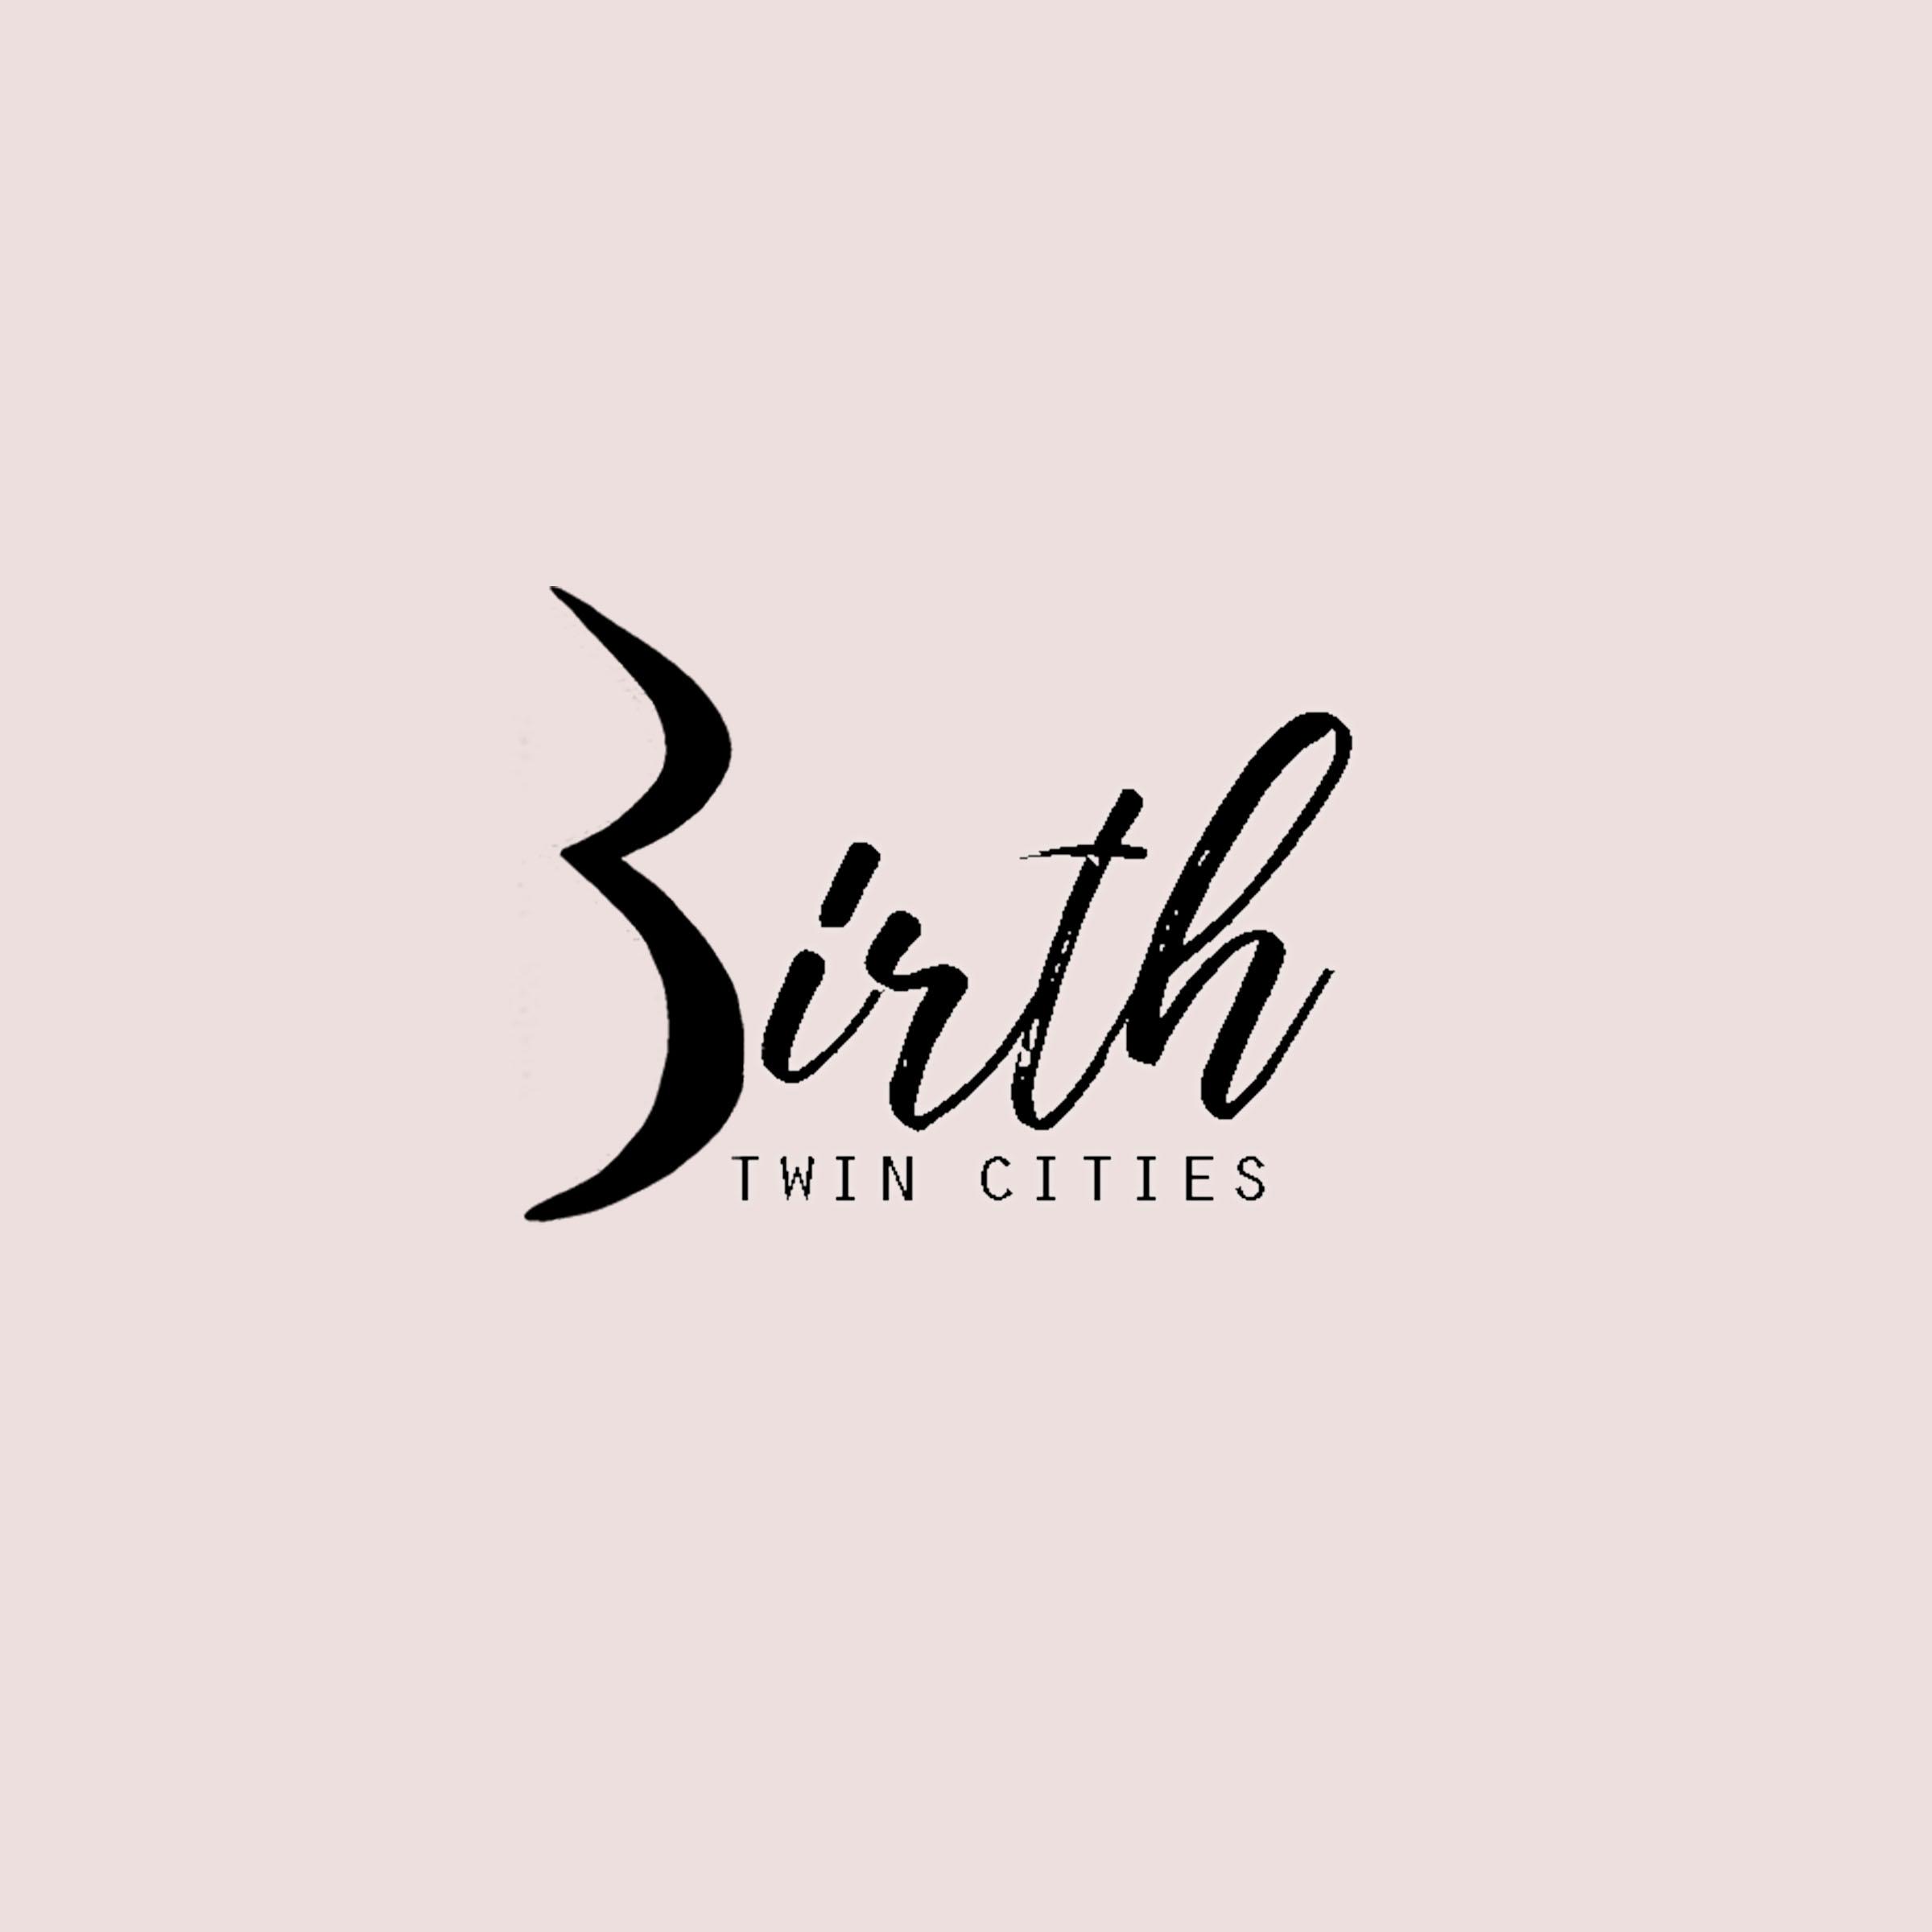 Birth Twin Cities